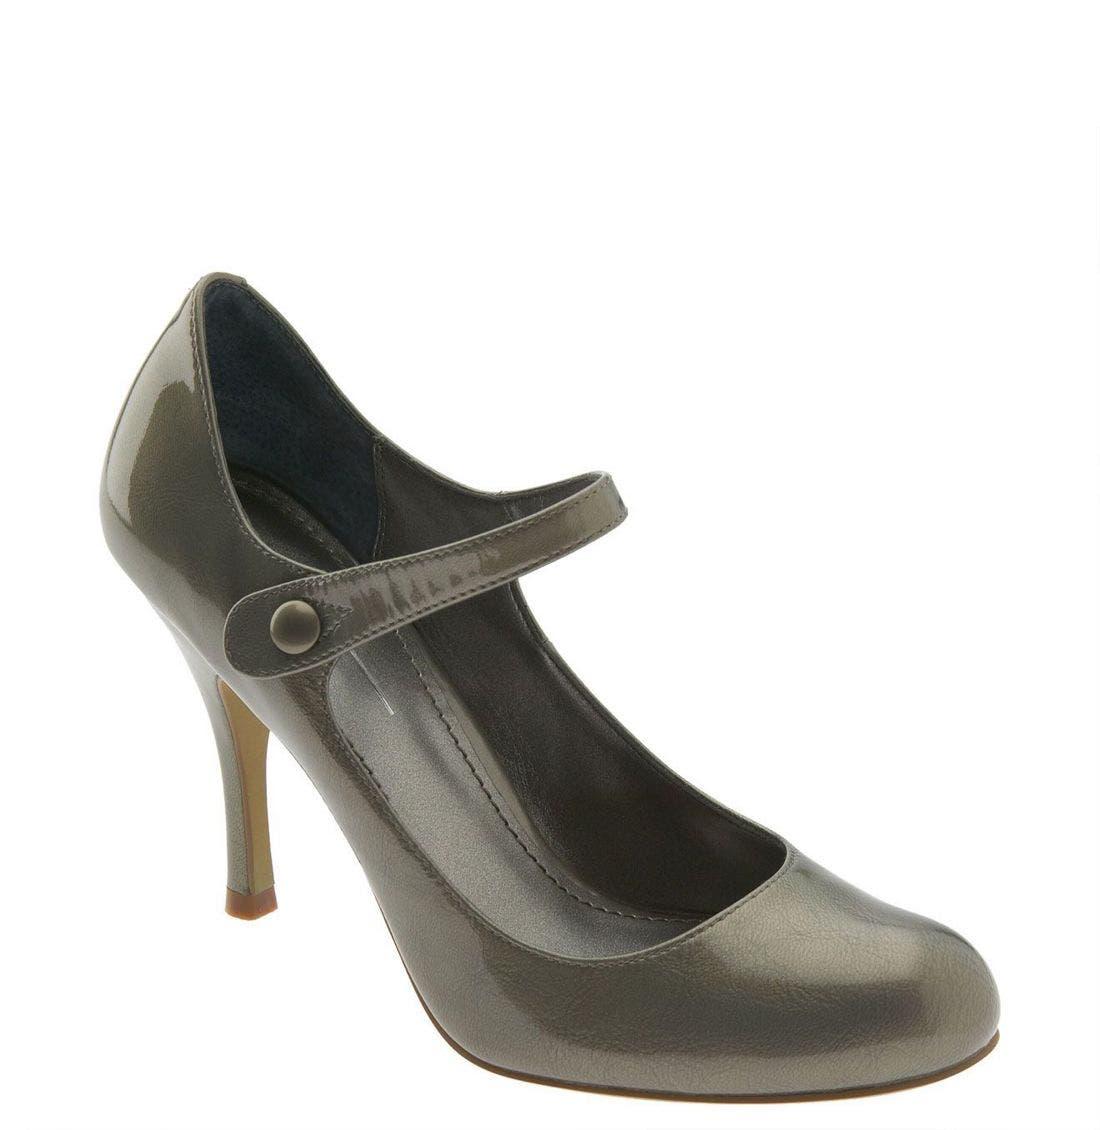 Main Image - Linea Paolo 'Zara' Patent Leather Mary Jane Pump